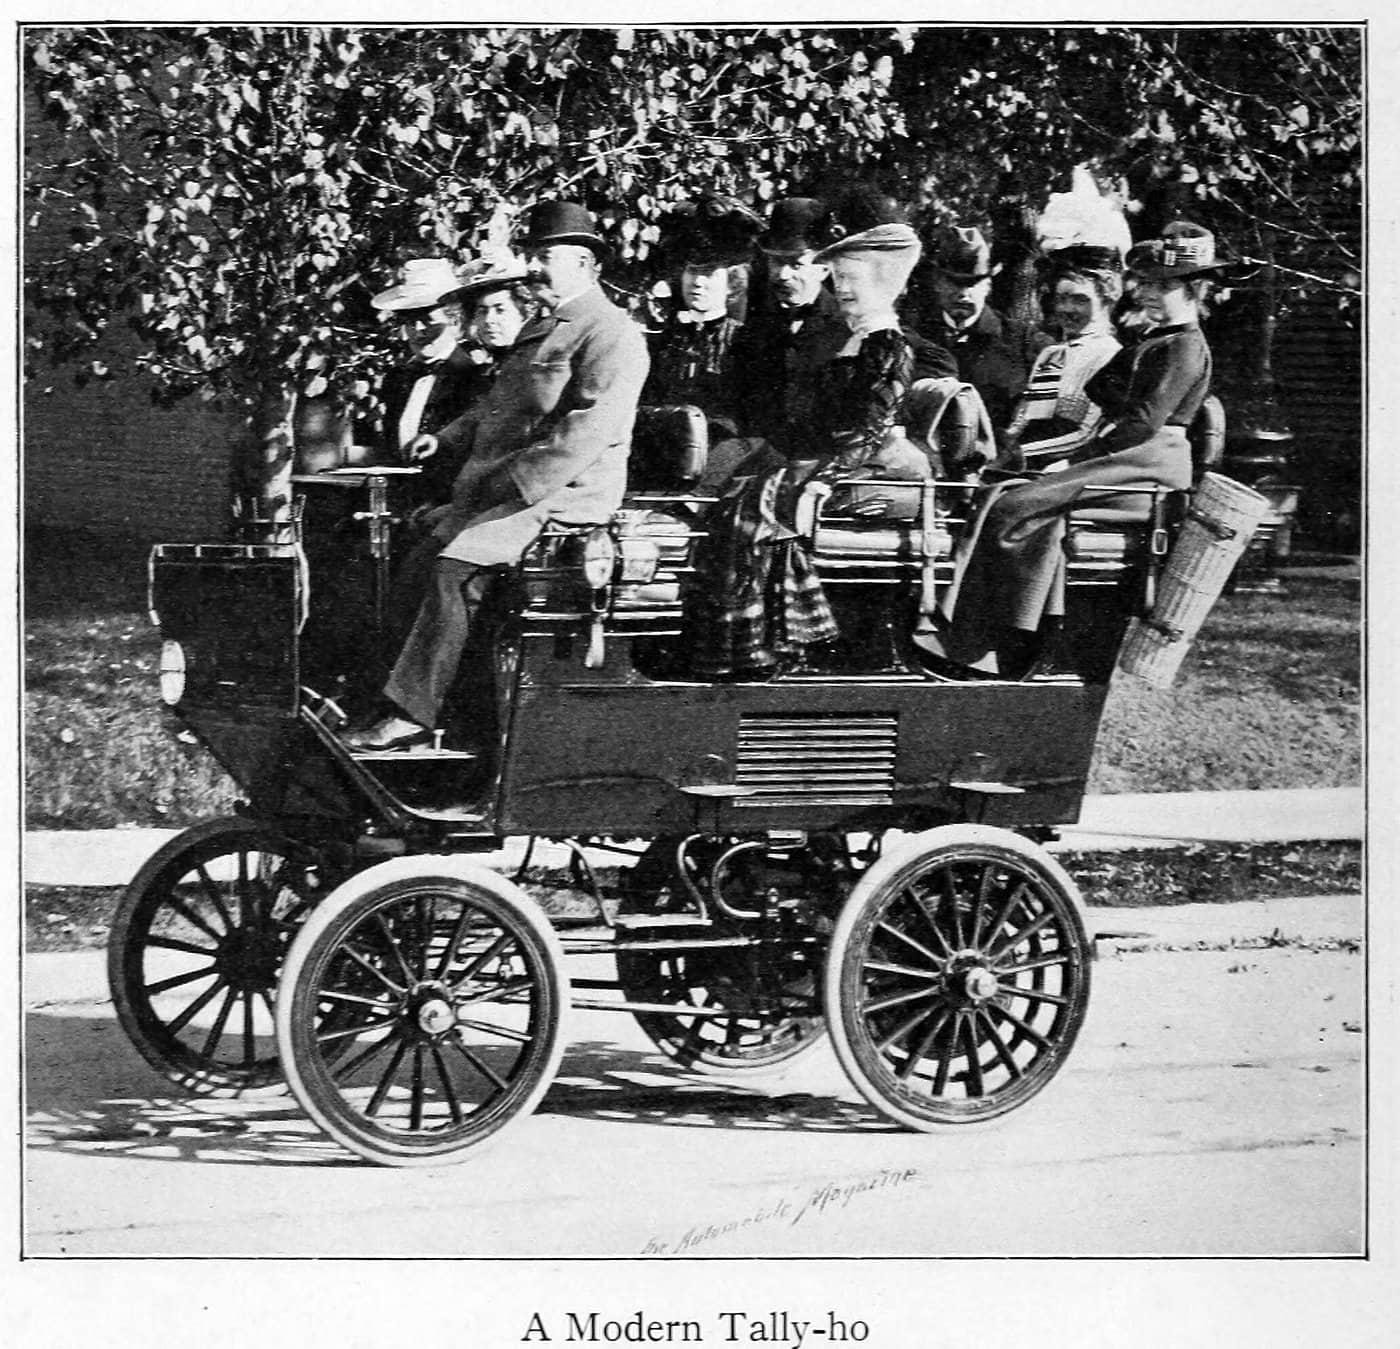 A modern Tally-ho (1899)